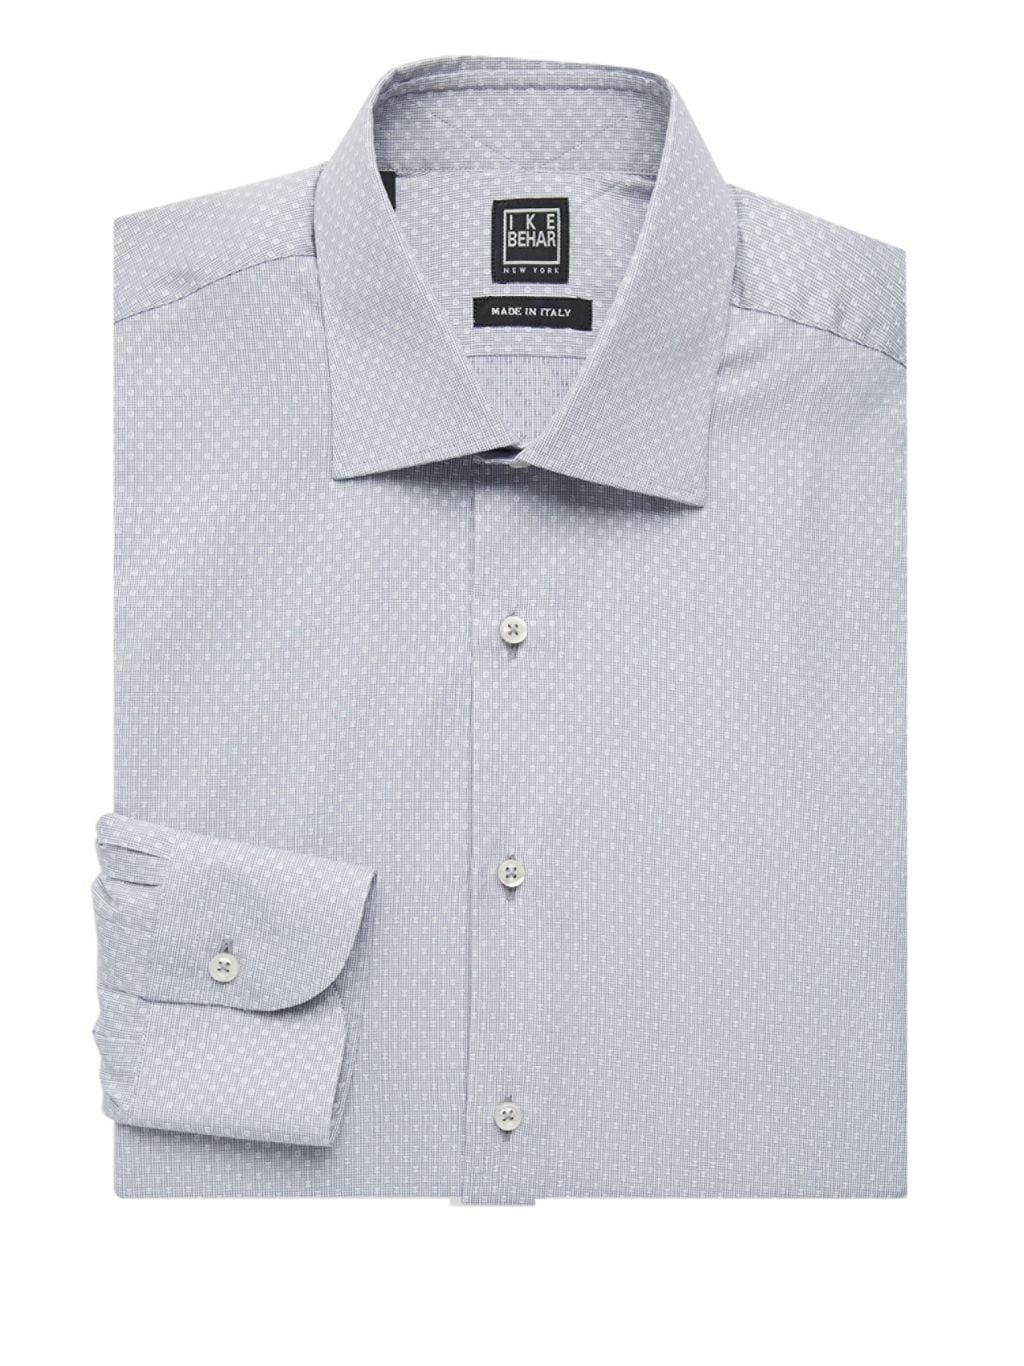 IKE by Ike Behar Regular-Fit Patterned Cotton Dress Shirt